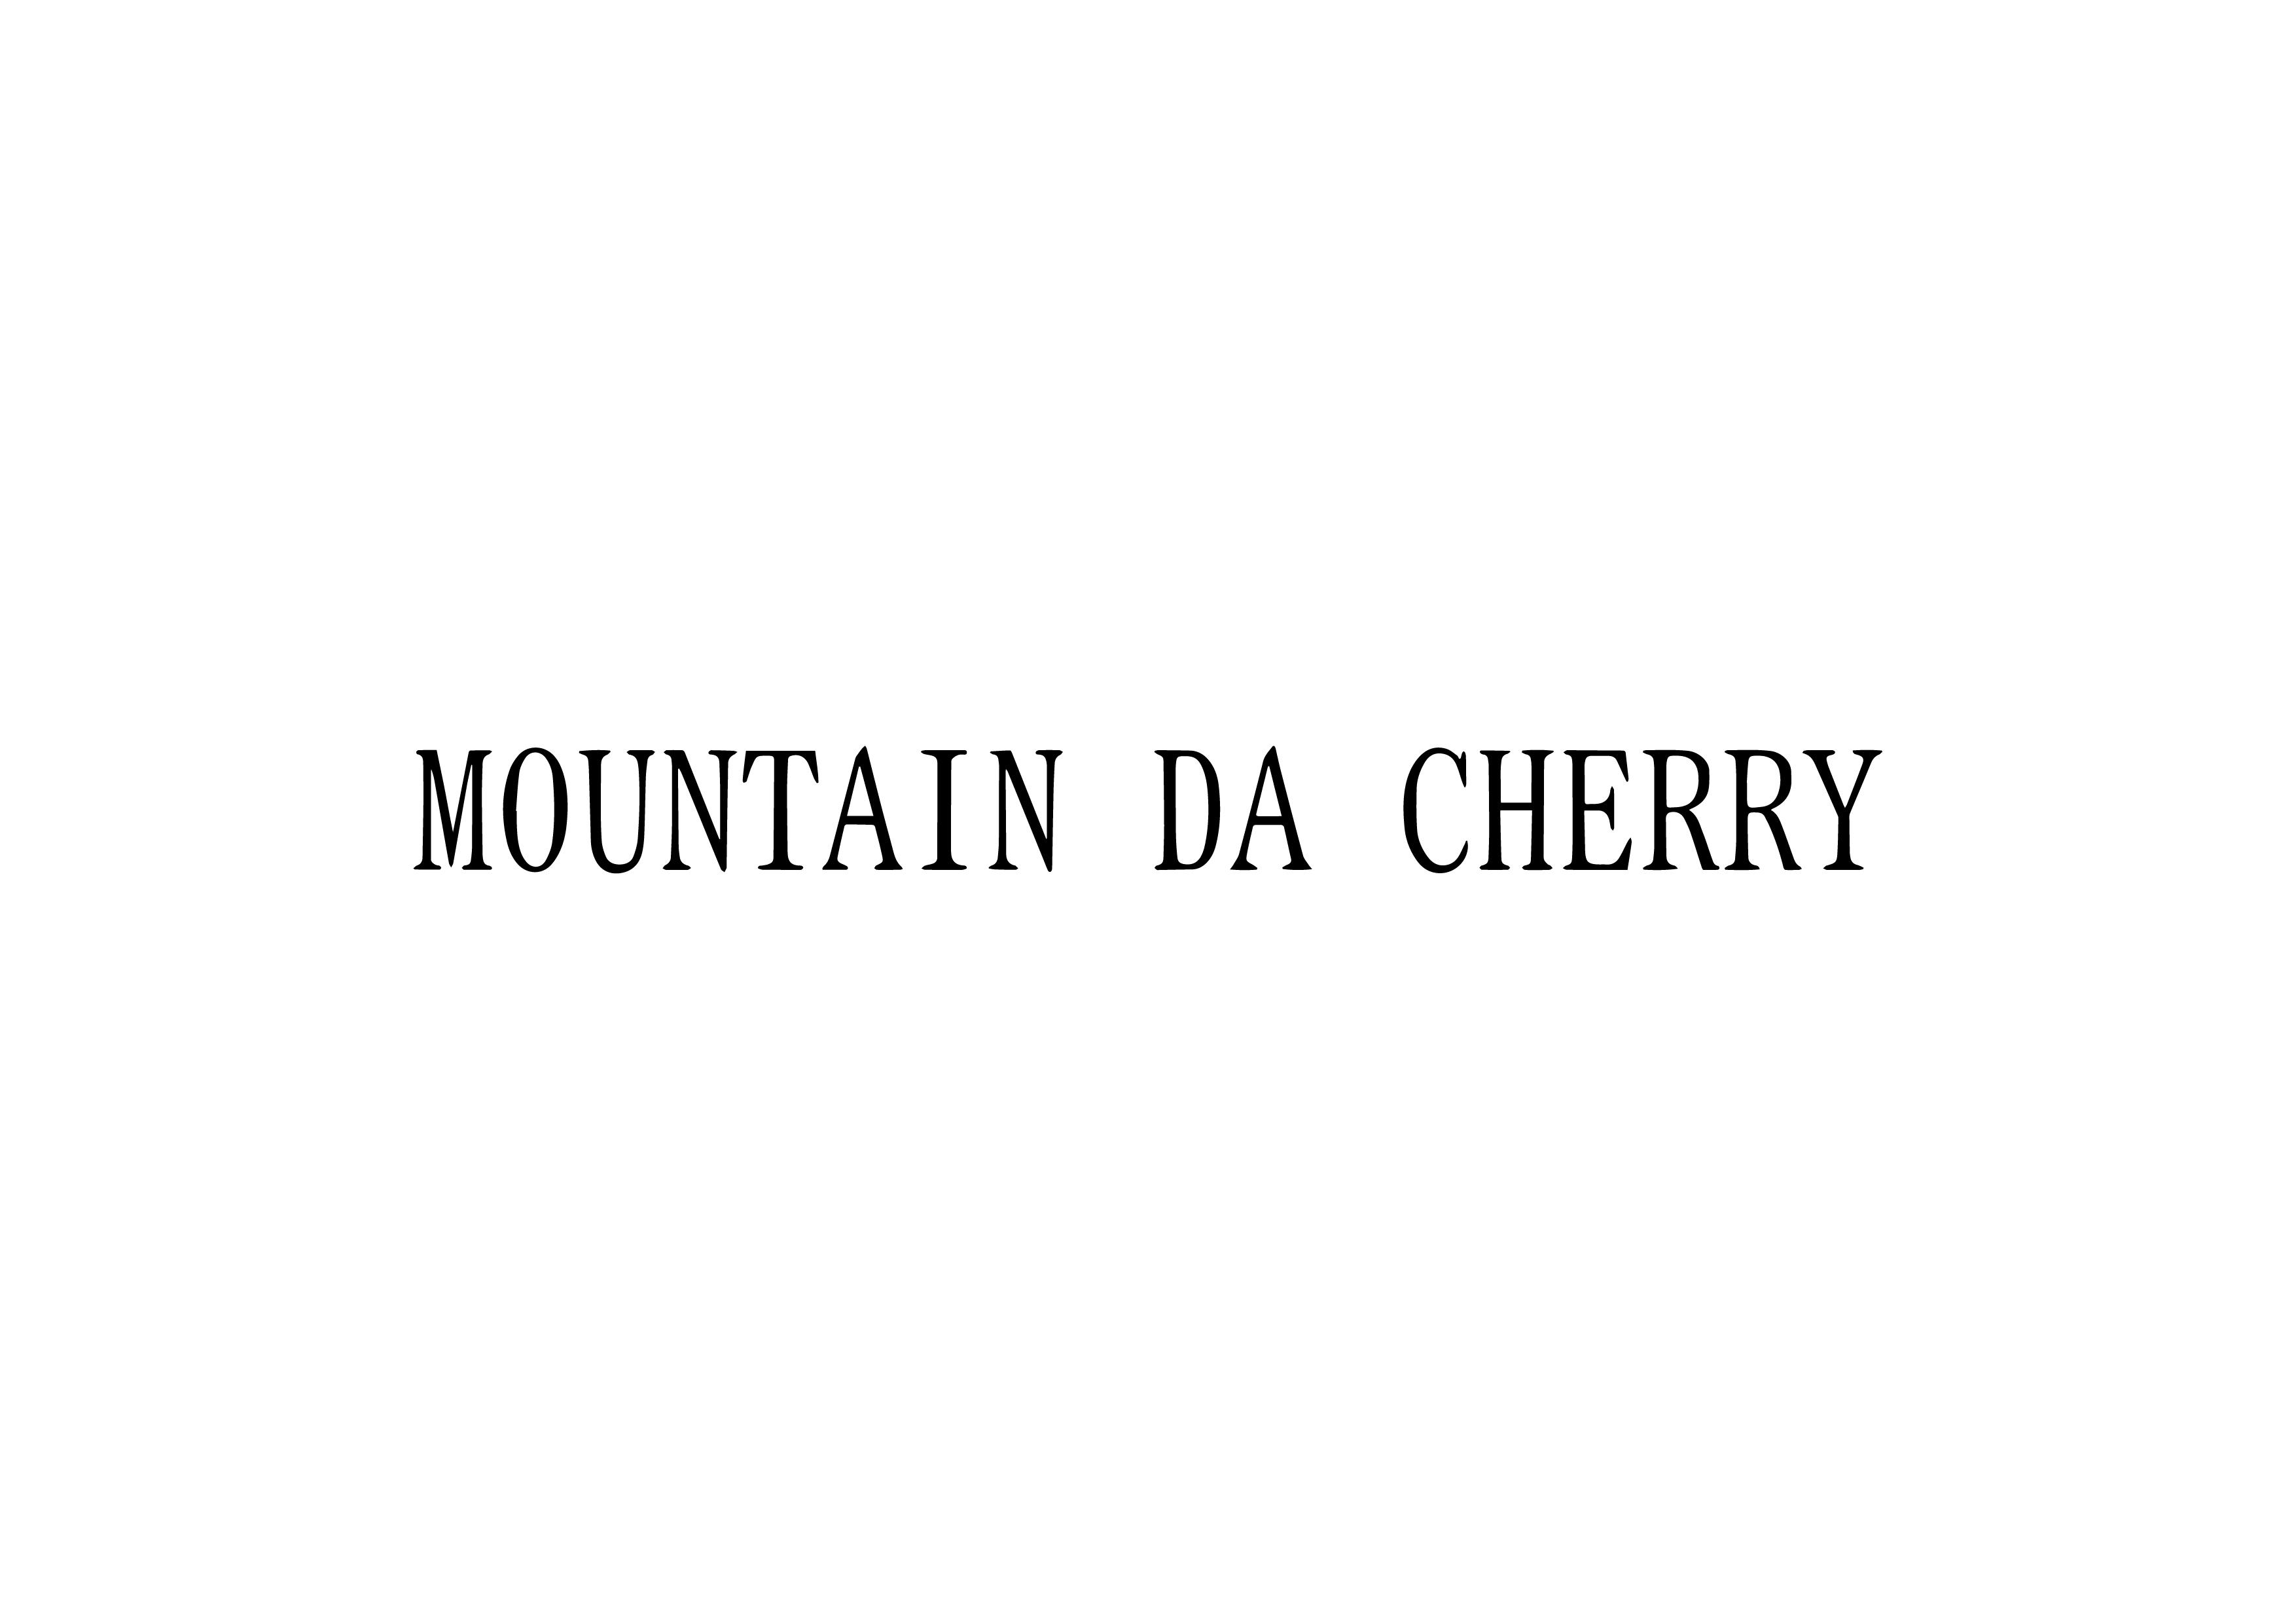 MOUNTAIN DA CHERRY